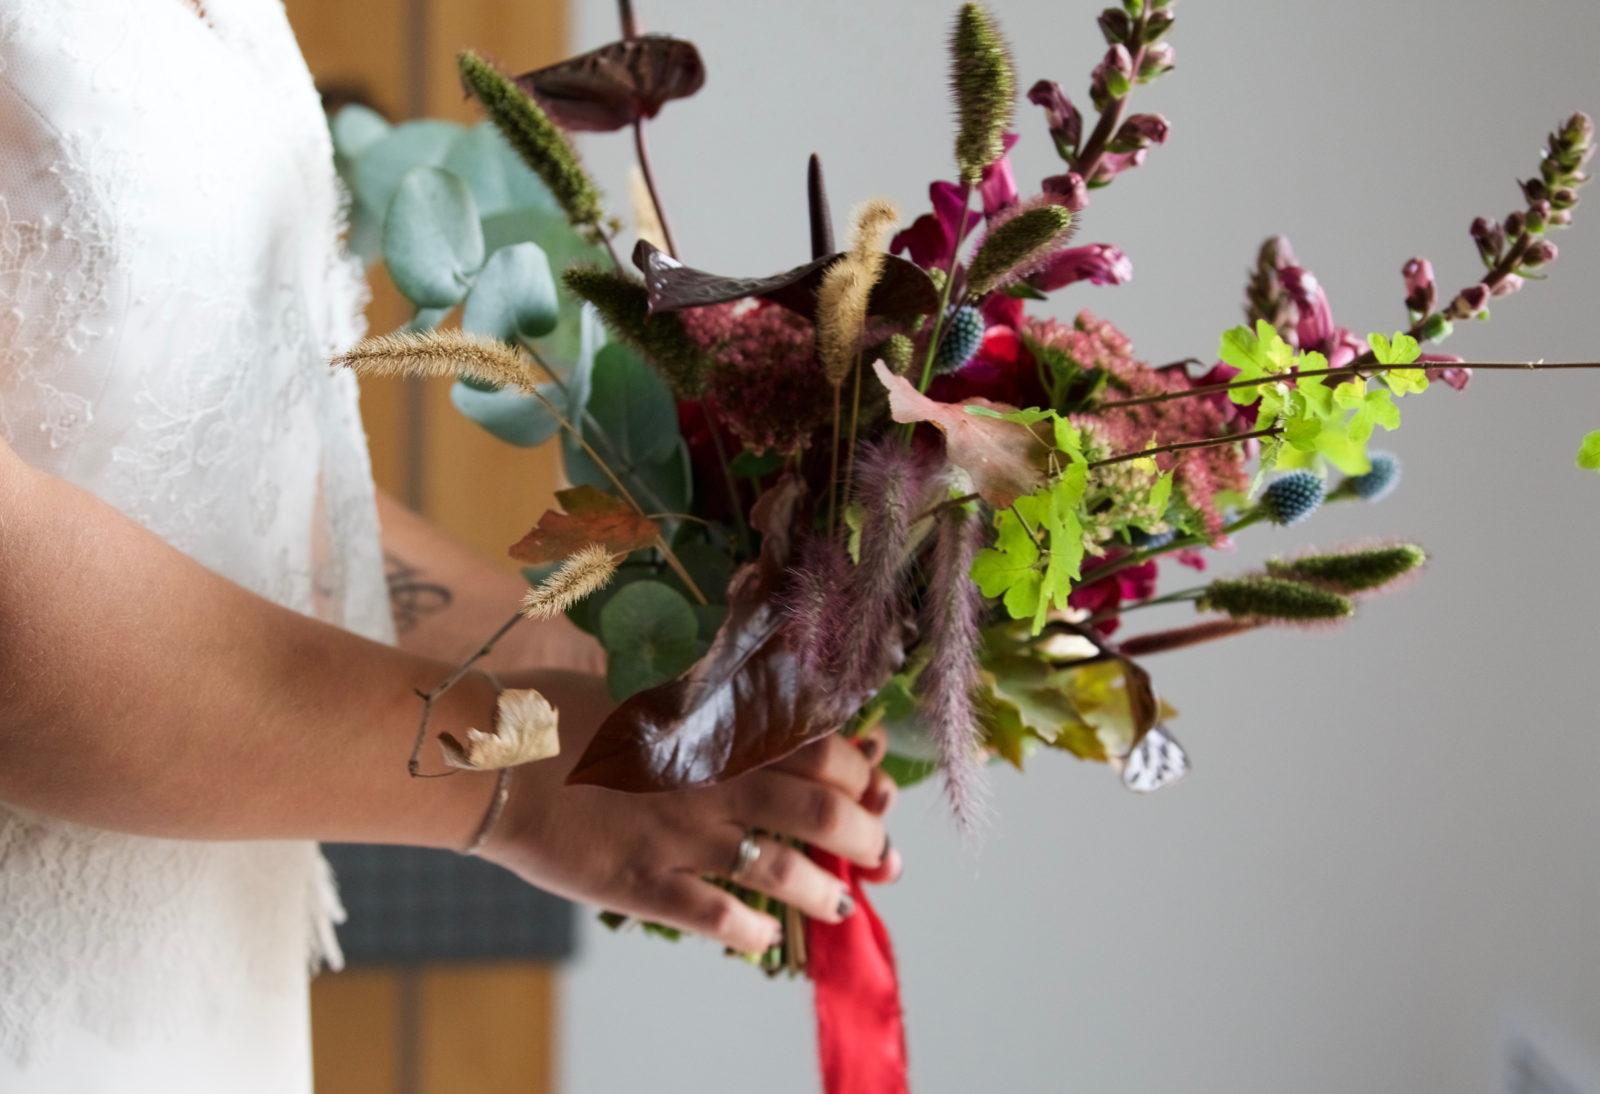 mariage-danslesvignes-photographe-atomiktoif-fleuriste-eudadecore-poitiers-limoges-cognac (7)